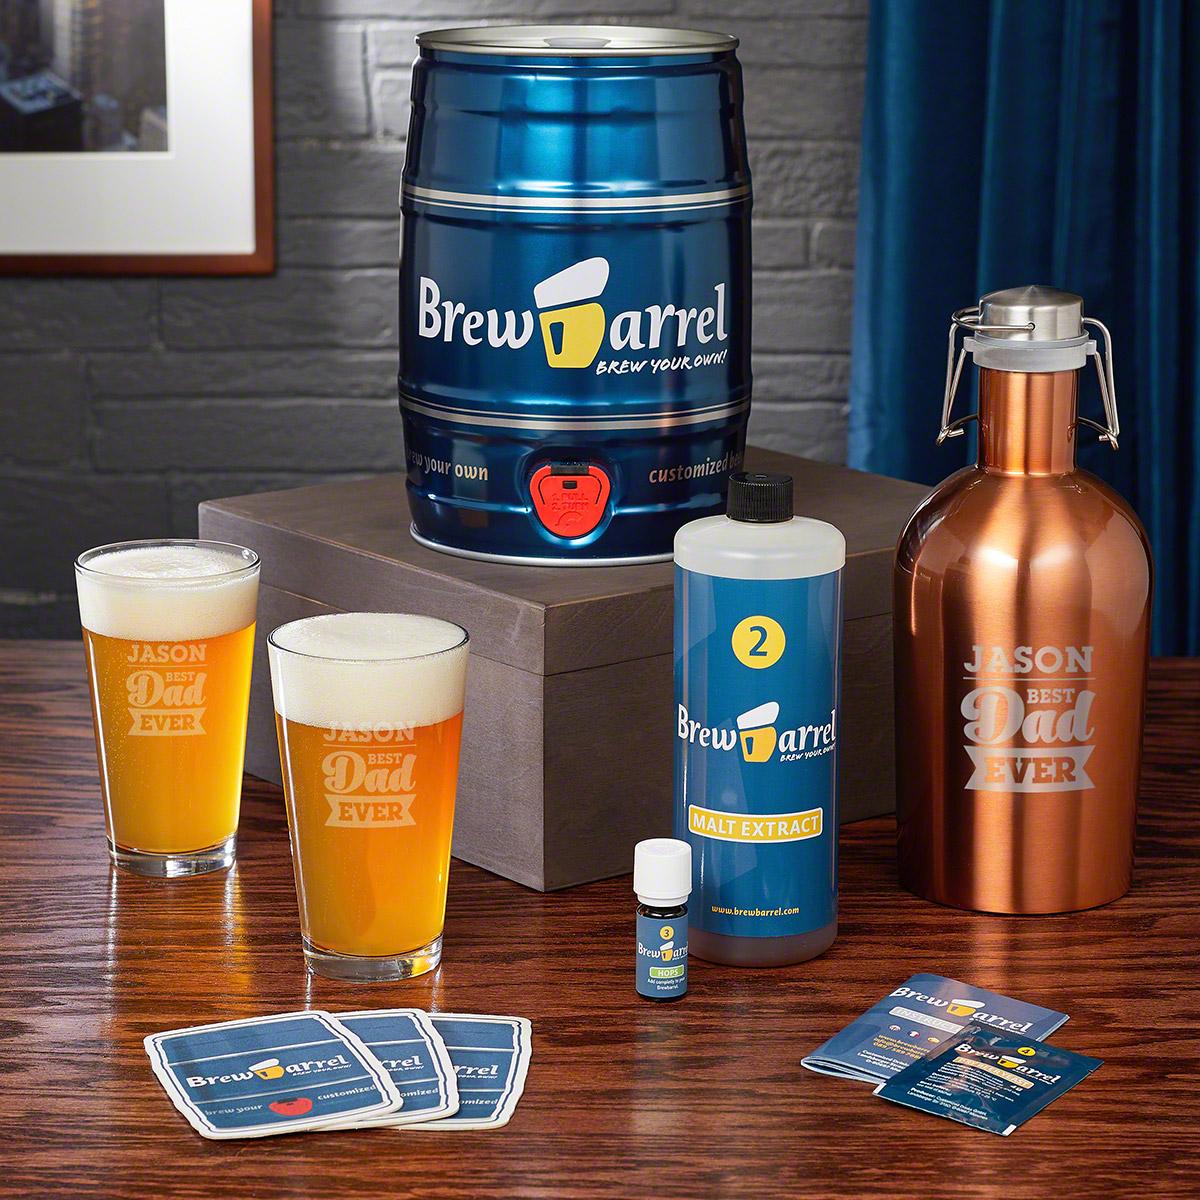 For the Best Dad Gift Set - Beer Glass Set with Brew Barrel Beer Making Kit